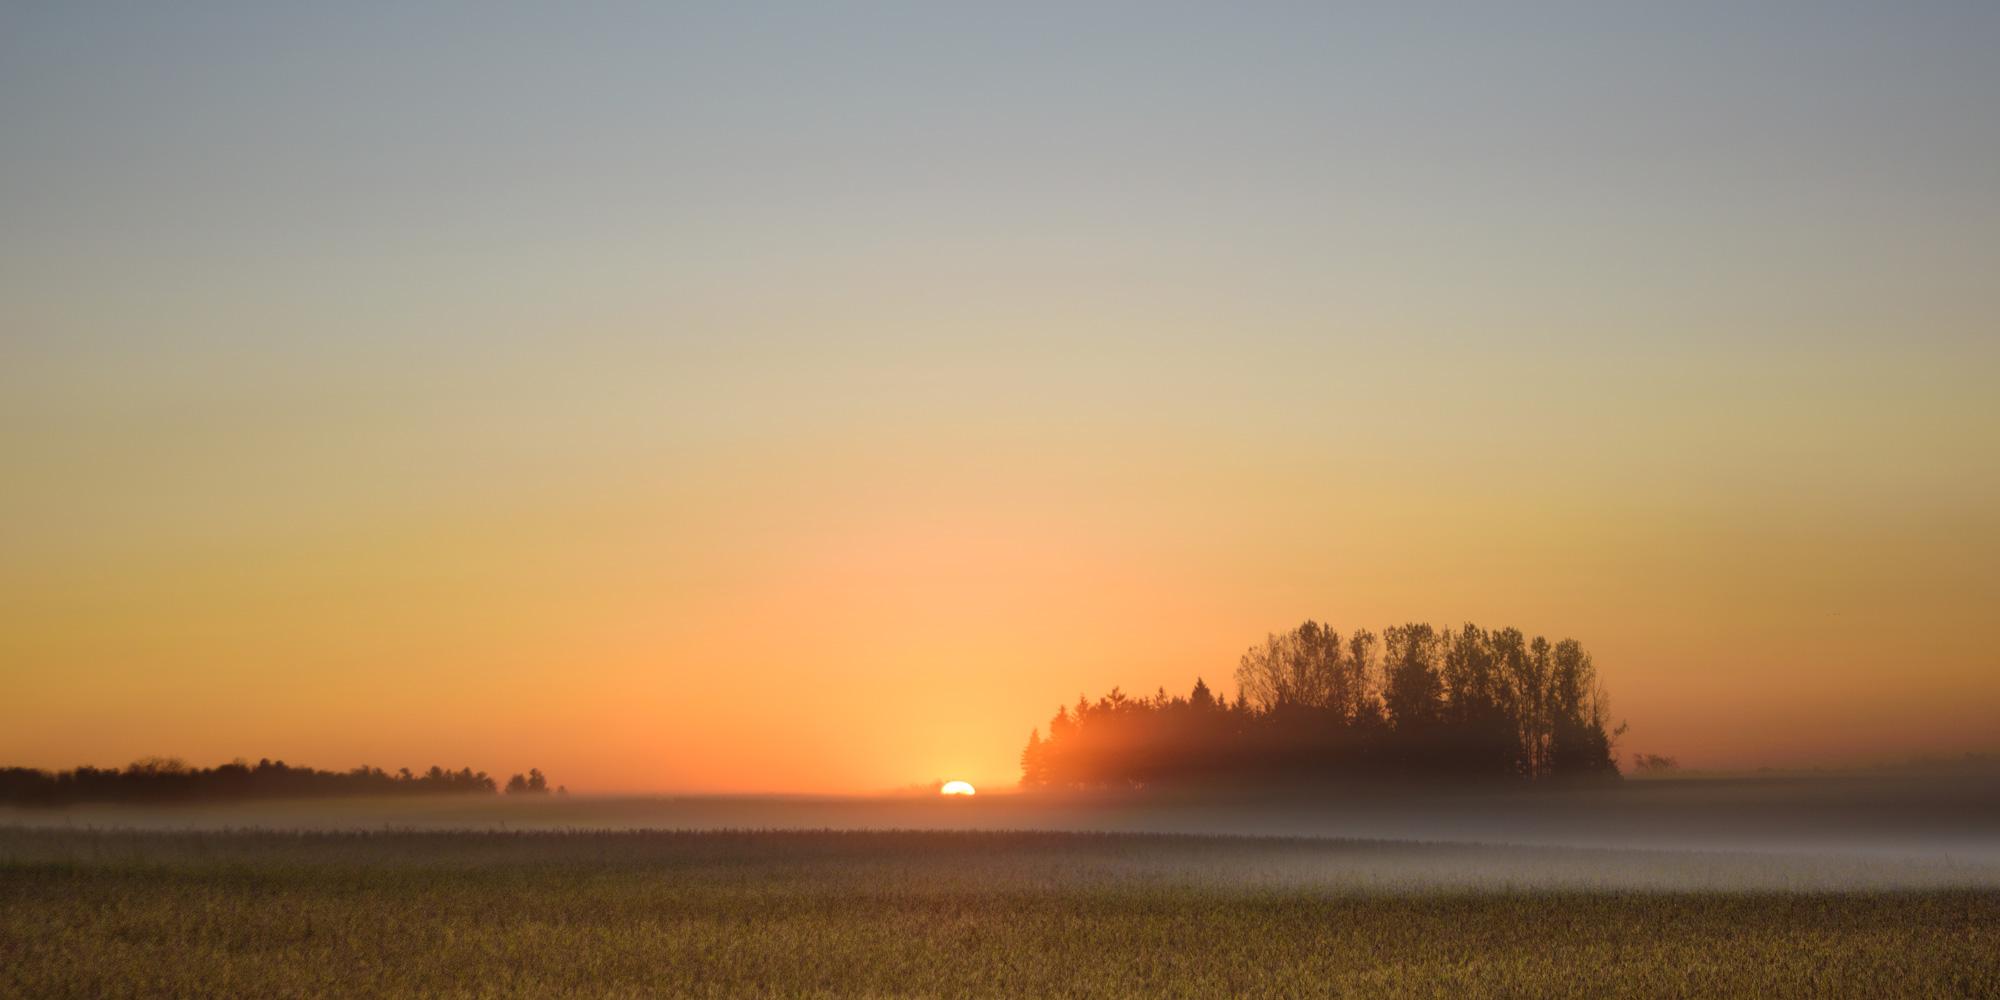 https://0901.nccdn.net/4_2/000/000/056/7dc/sunrise-glory.jpg